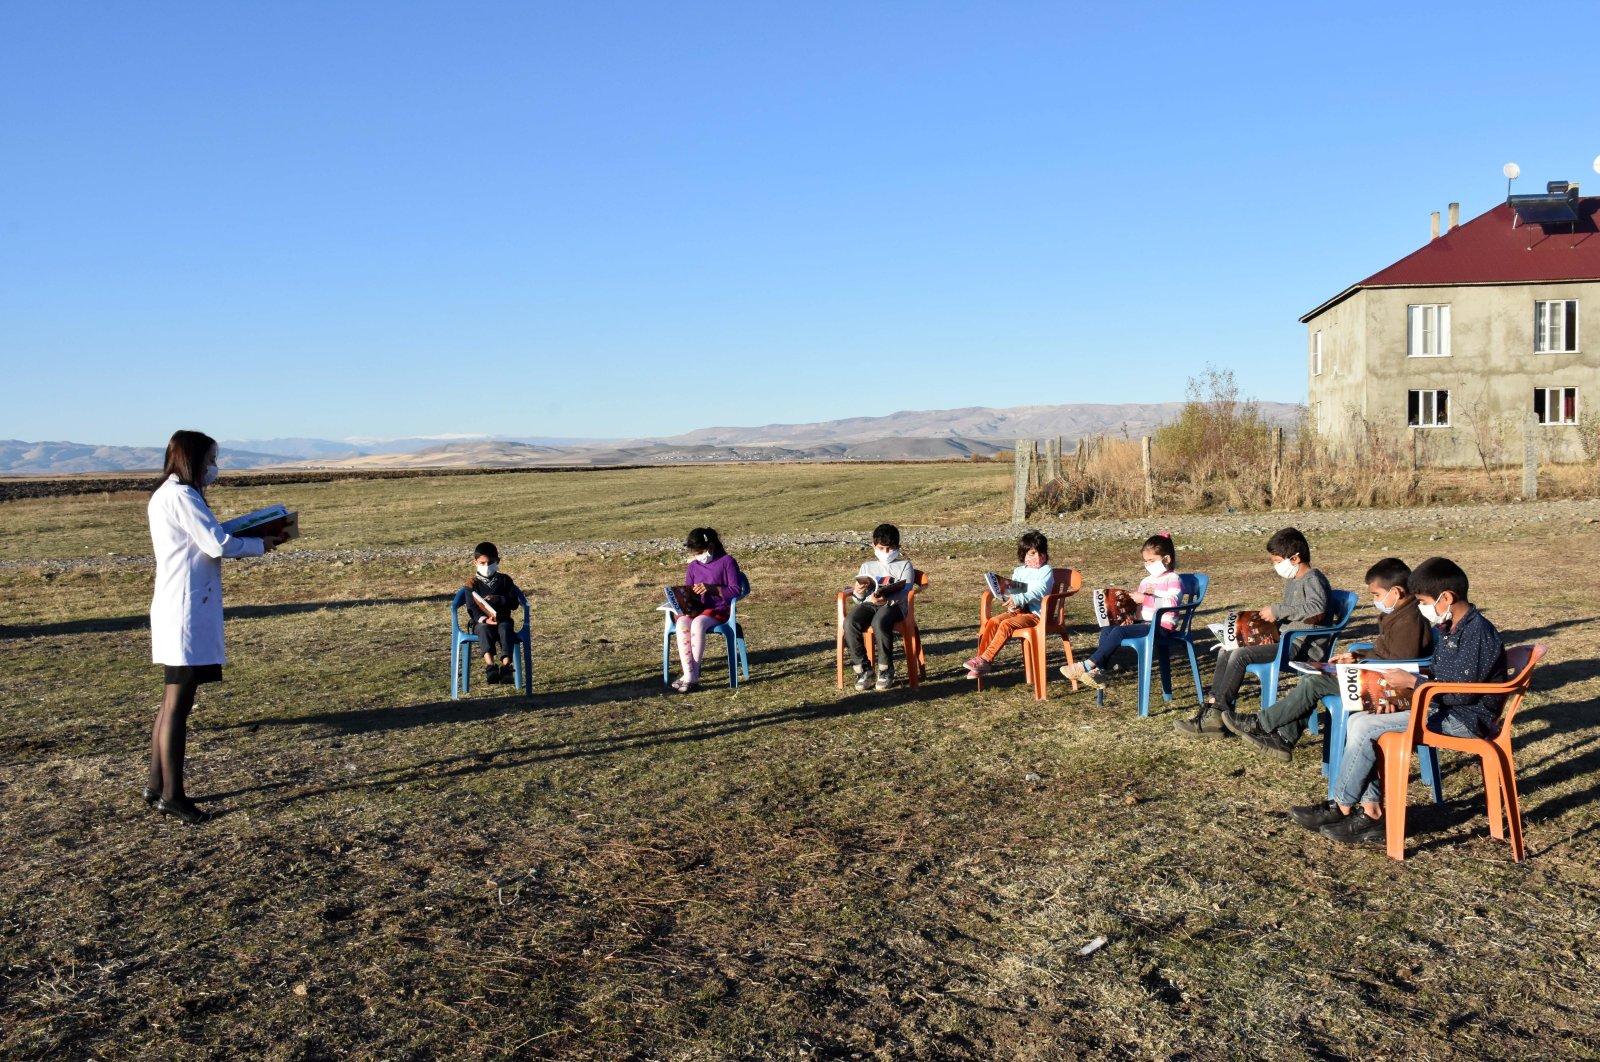 Teacher Tuğba Harmankaya reads books with her students on Teachers' Day, in Muş, eastern Turkey, Nov. 24, 2020. (AA Photo)